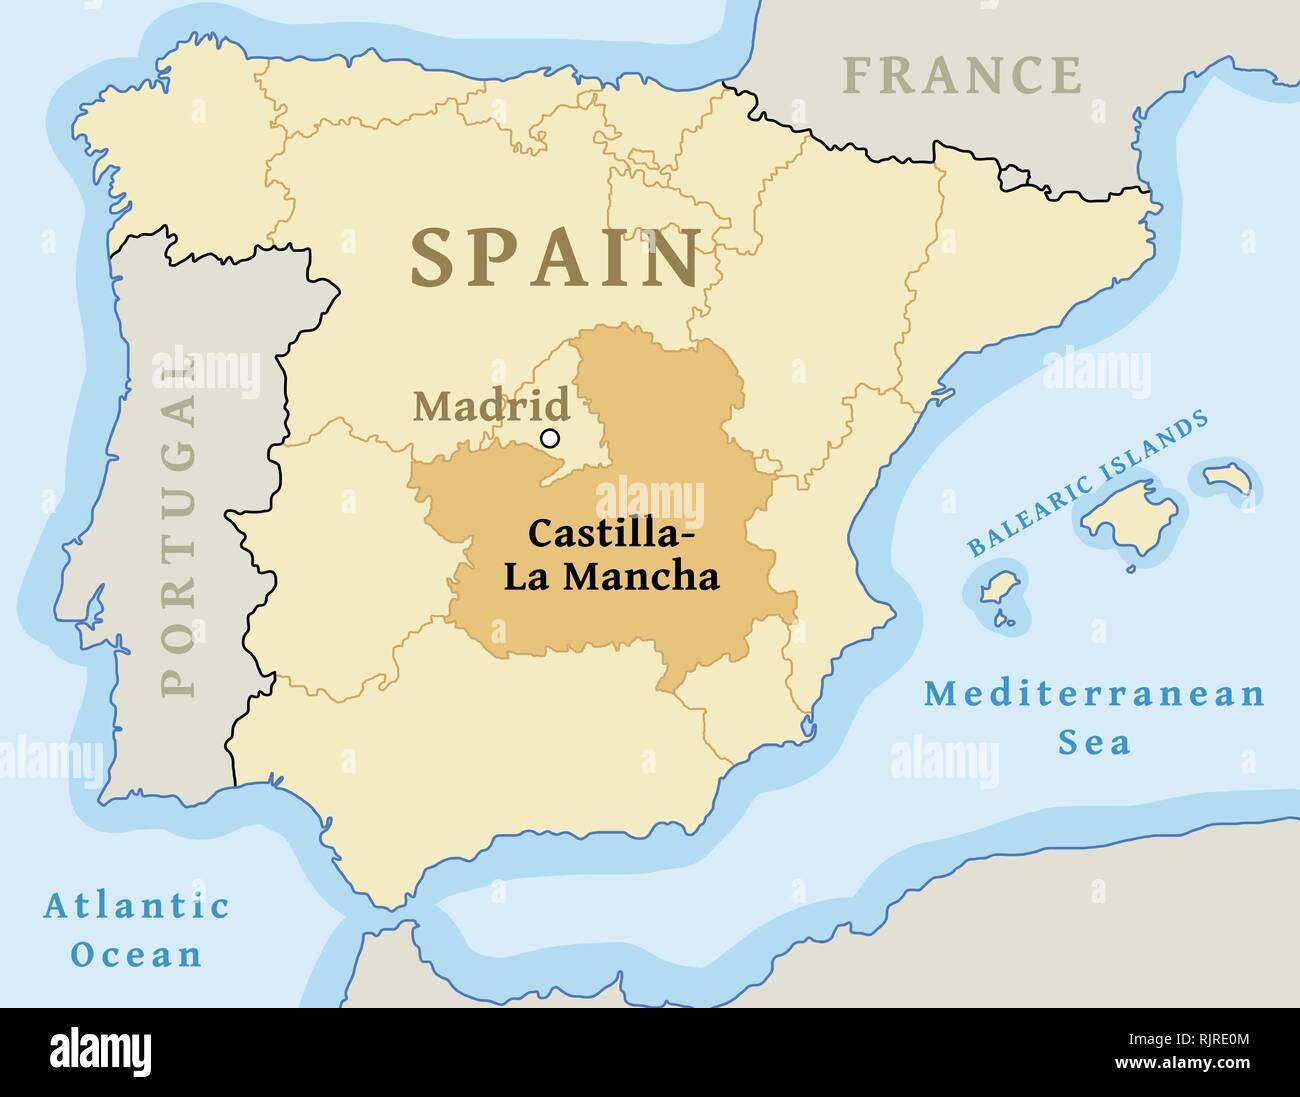 La Mancha Spain Map.Castilla La Mancha Autonomous Community Location Map Within Spain